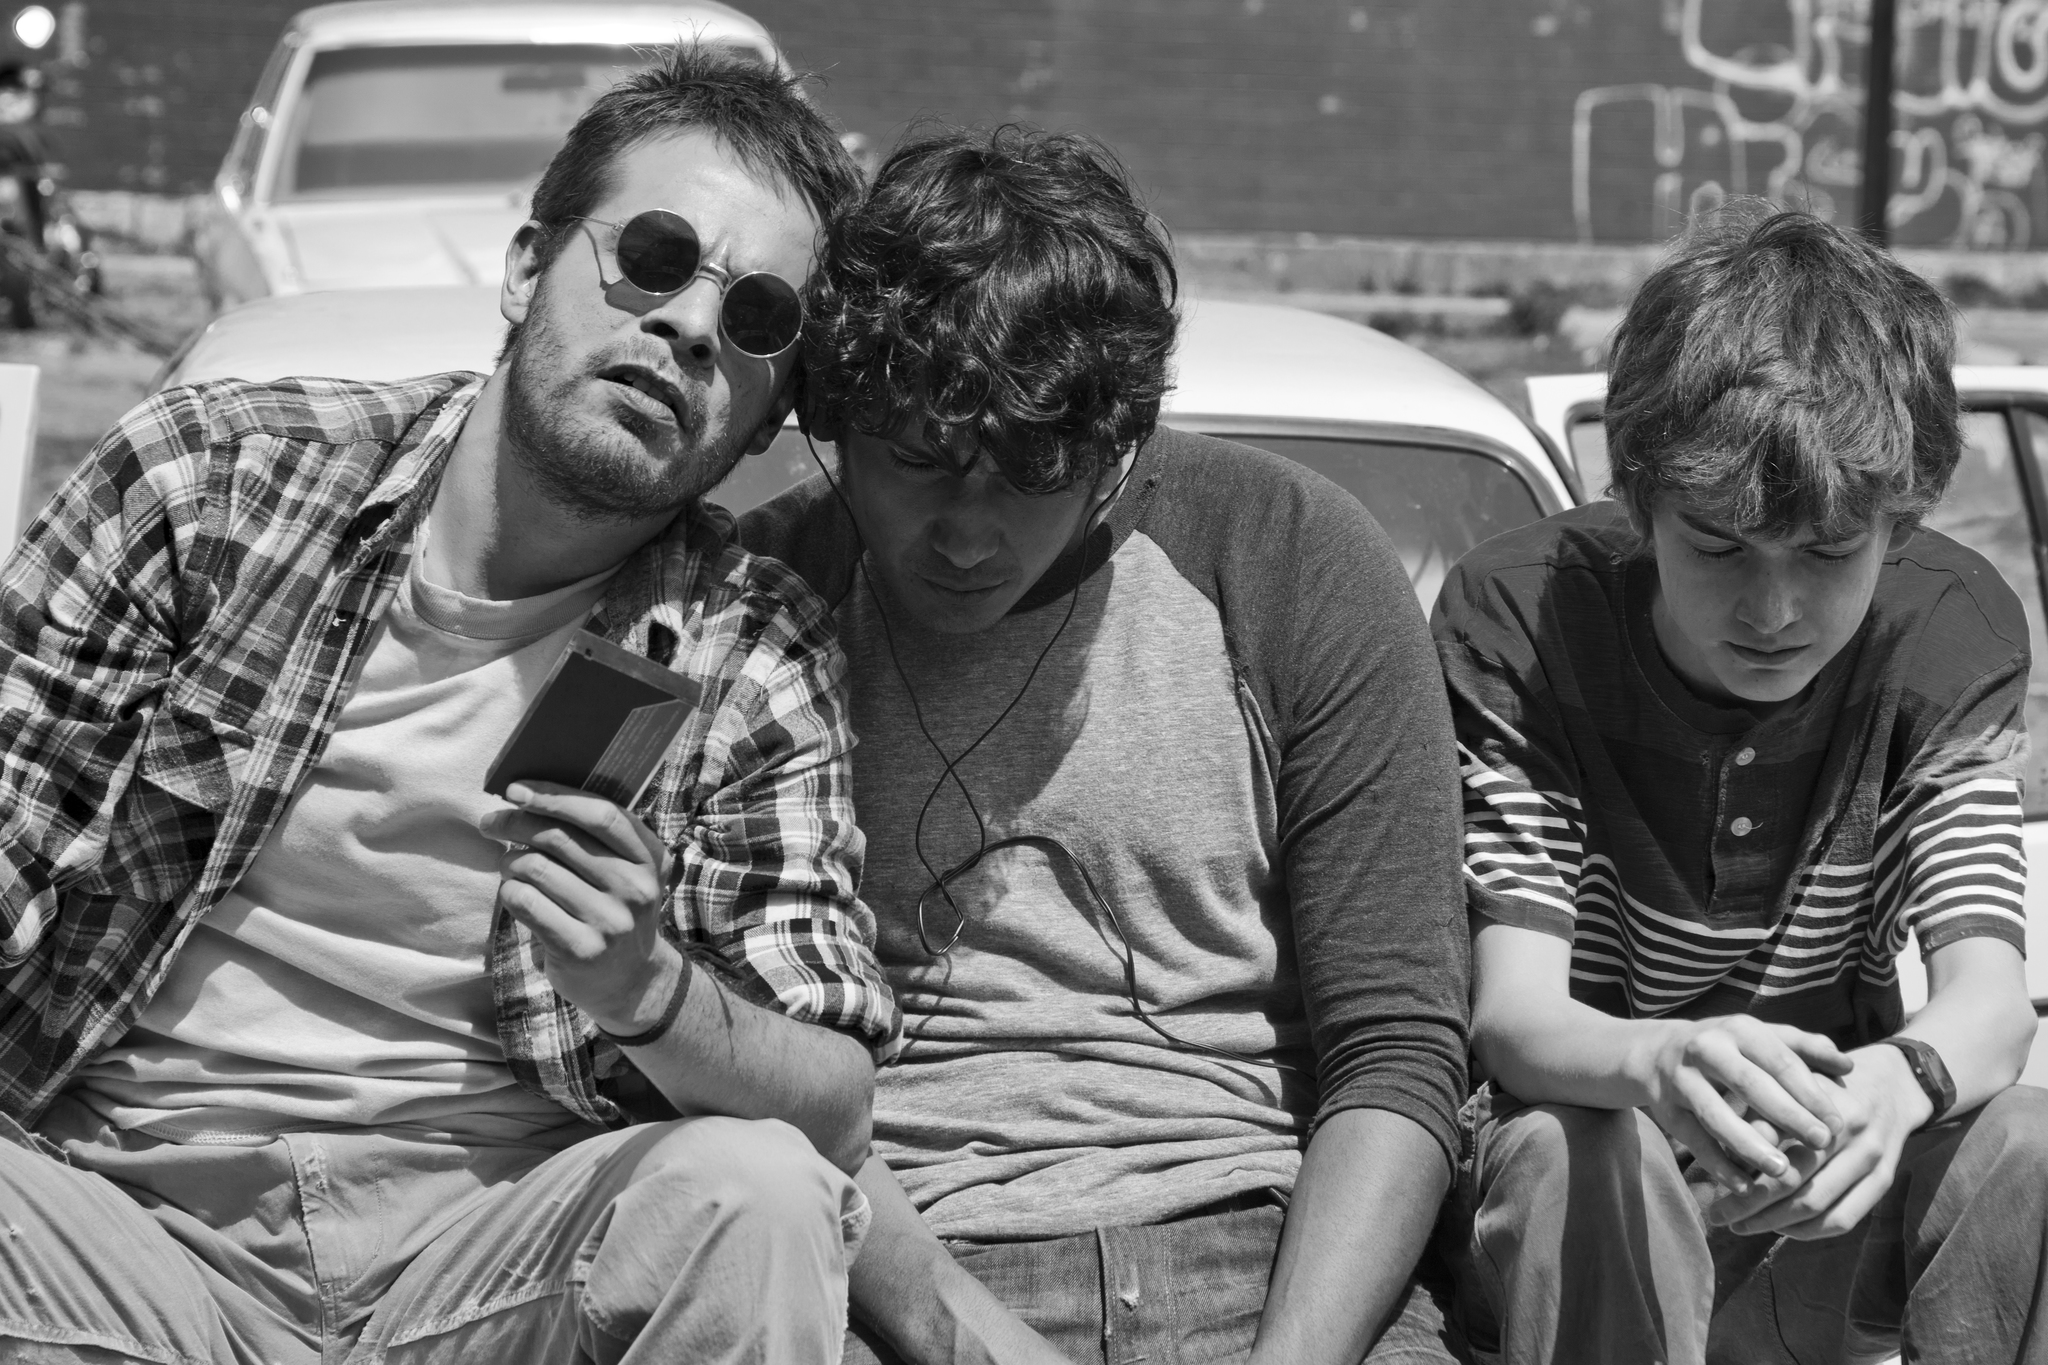 Leonardo Ortizgris, Tenoch Huerta, and Sebastián Aguirre in Güeros (2014)